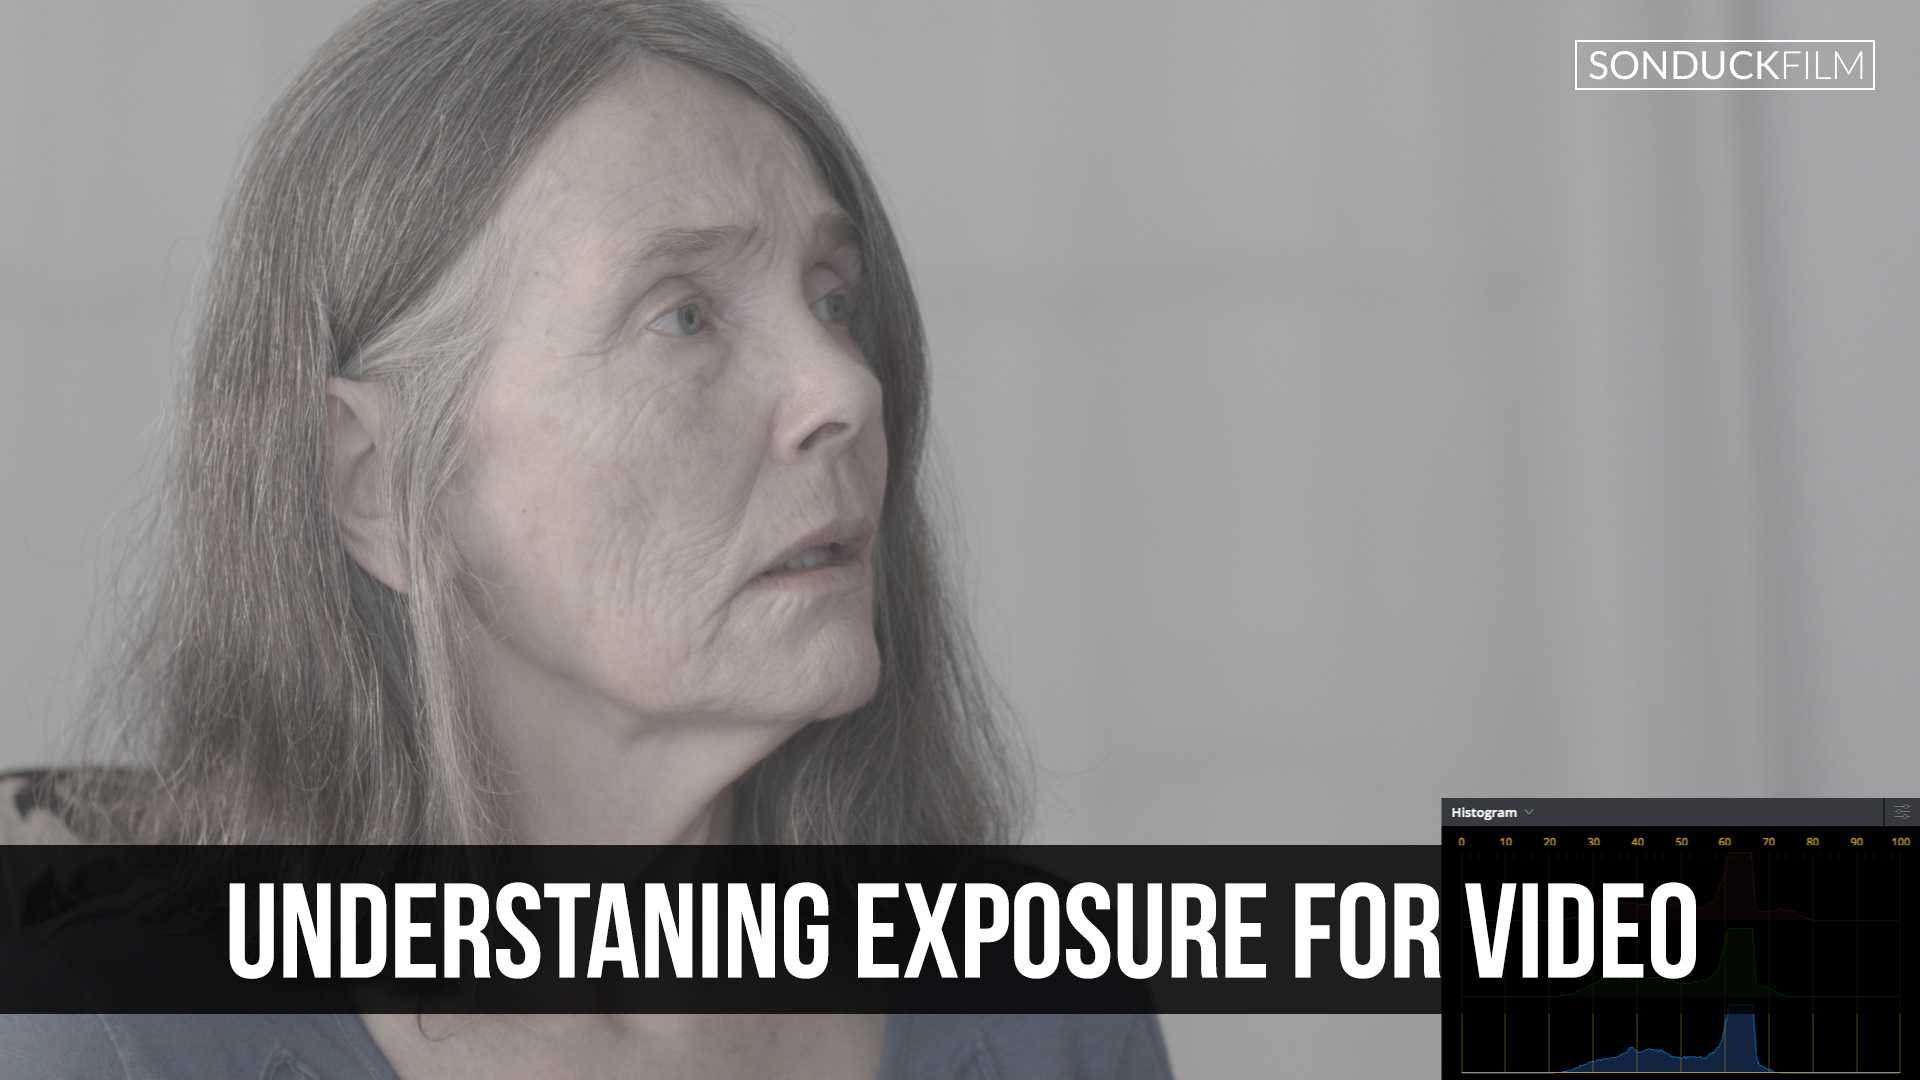 Video-Exposure